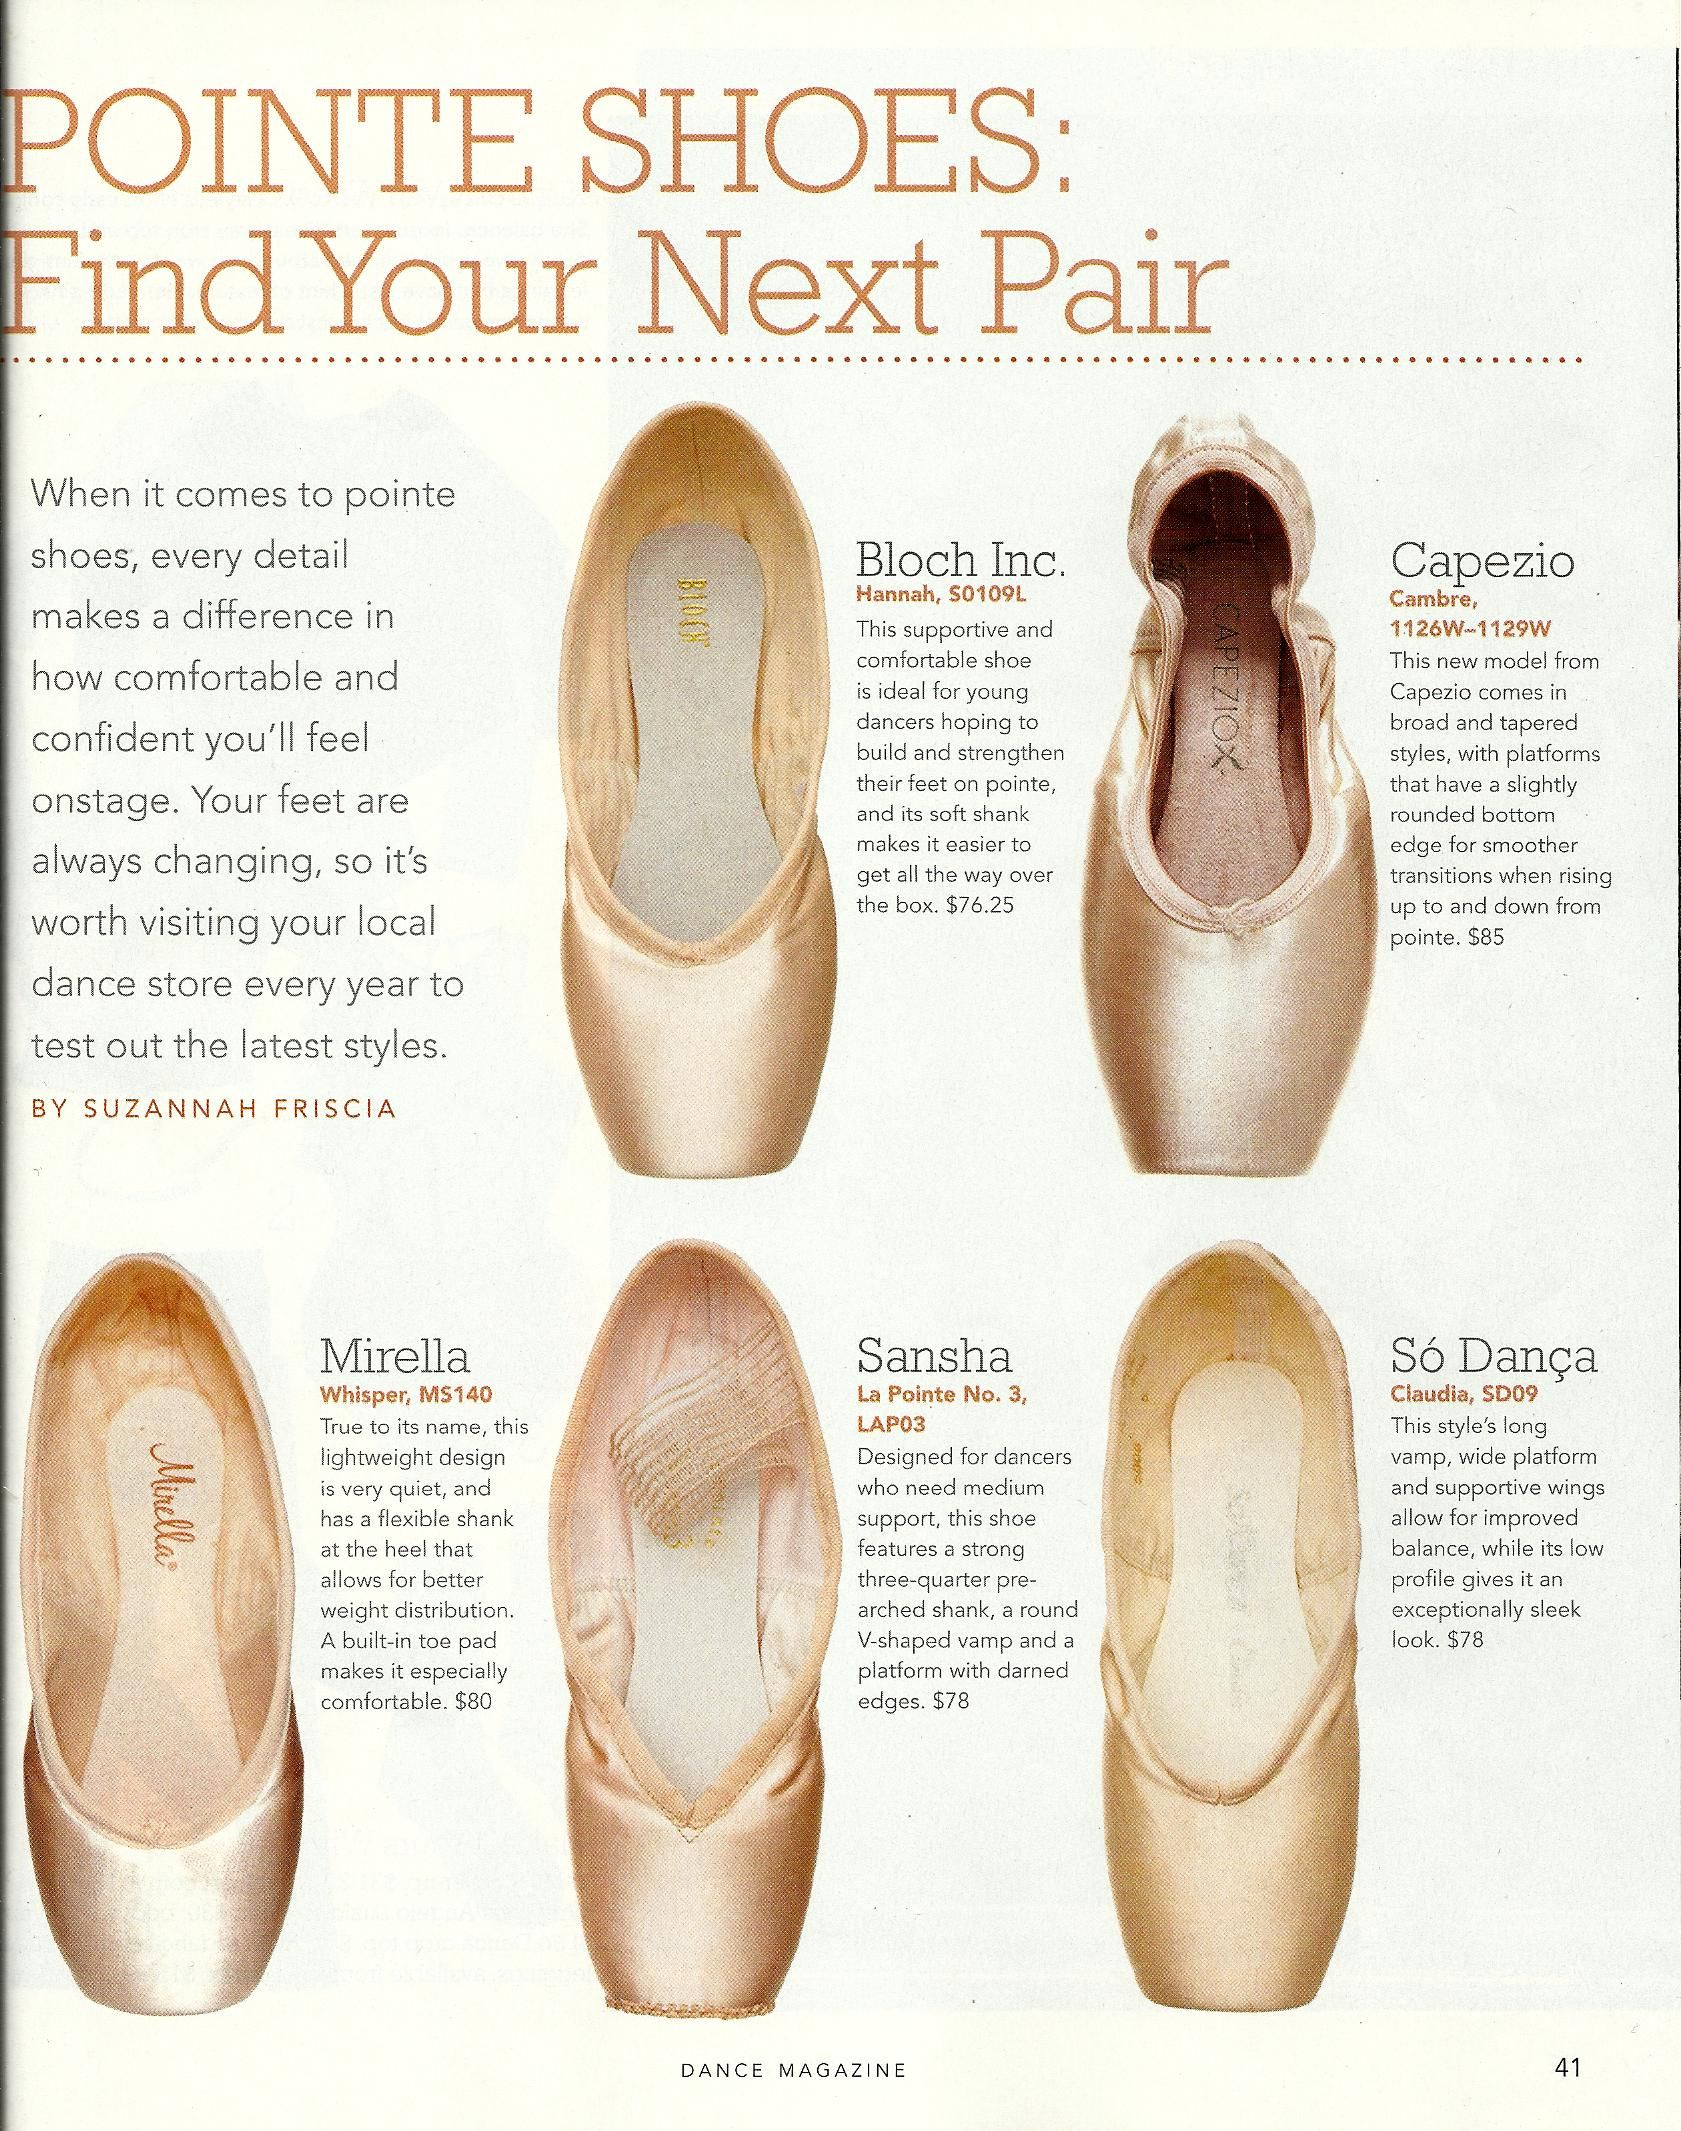 La Pointe V-Cut Tapered Box Pointe Shoes